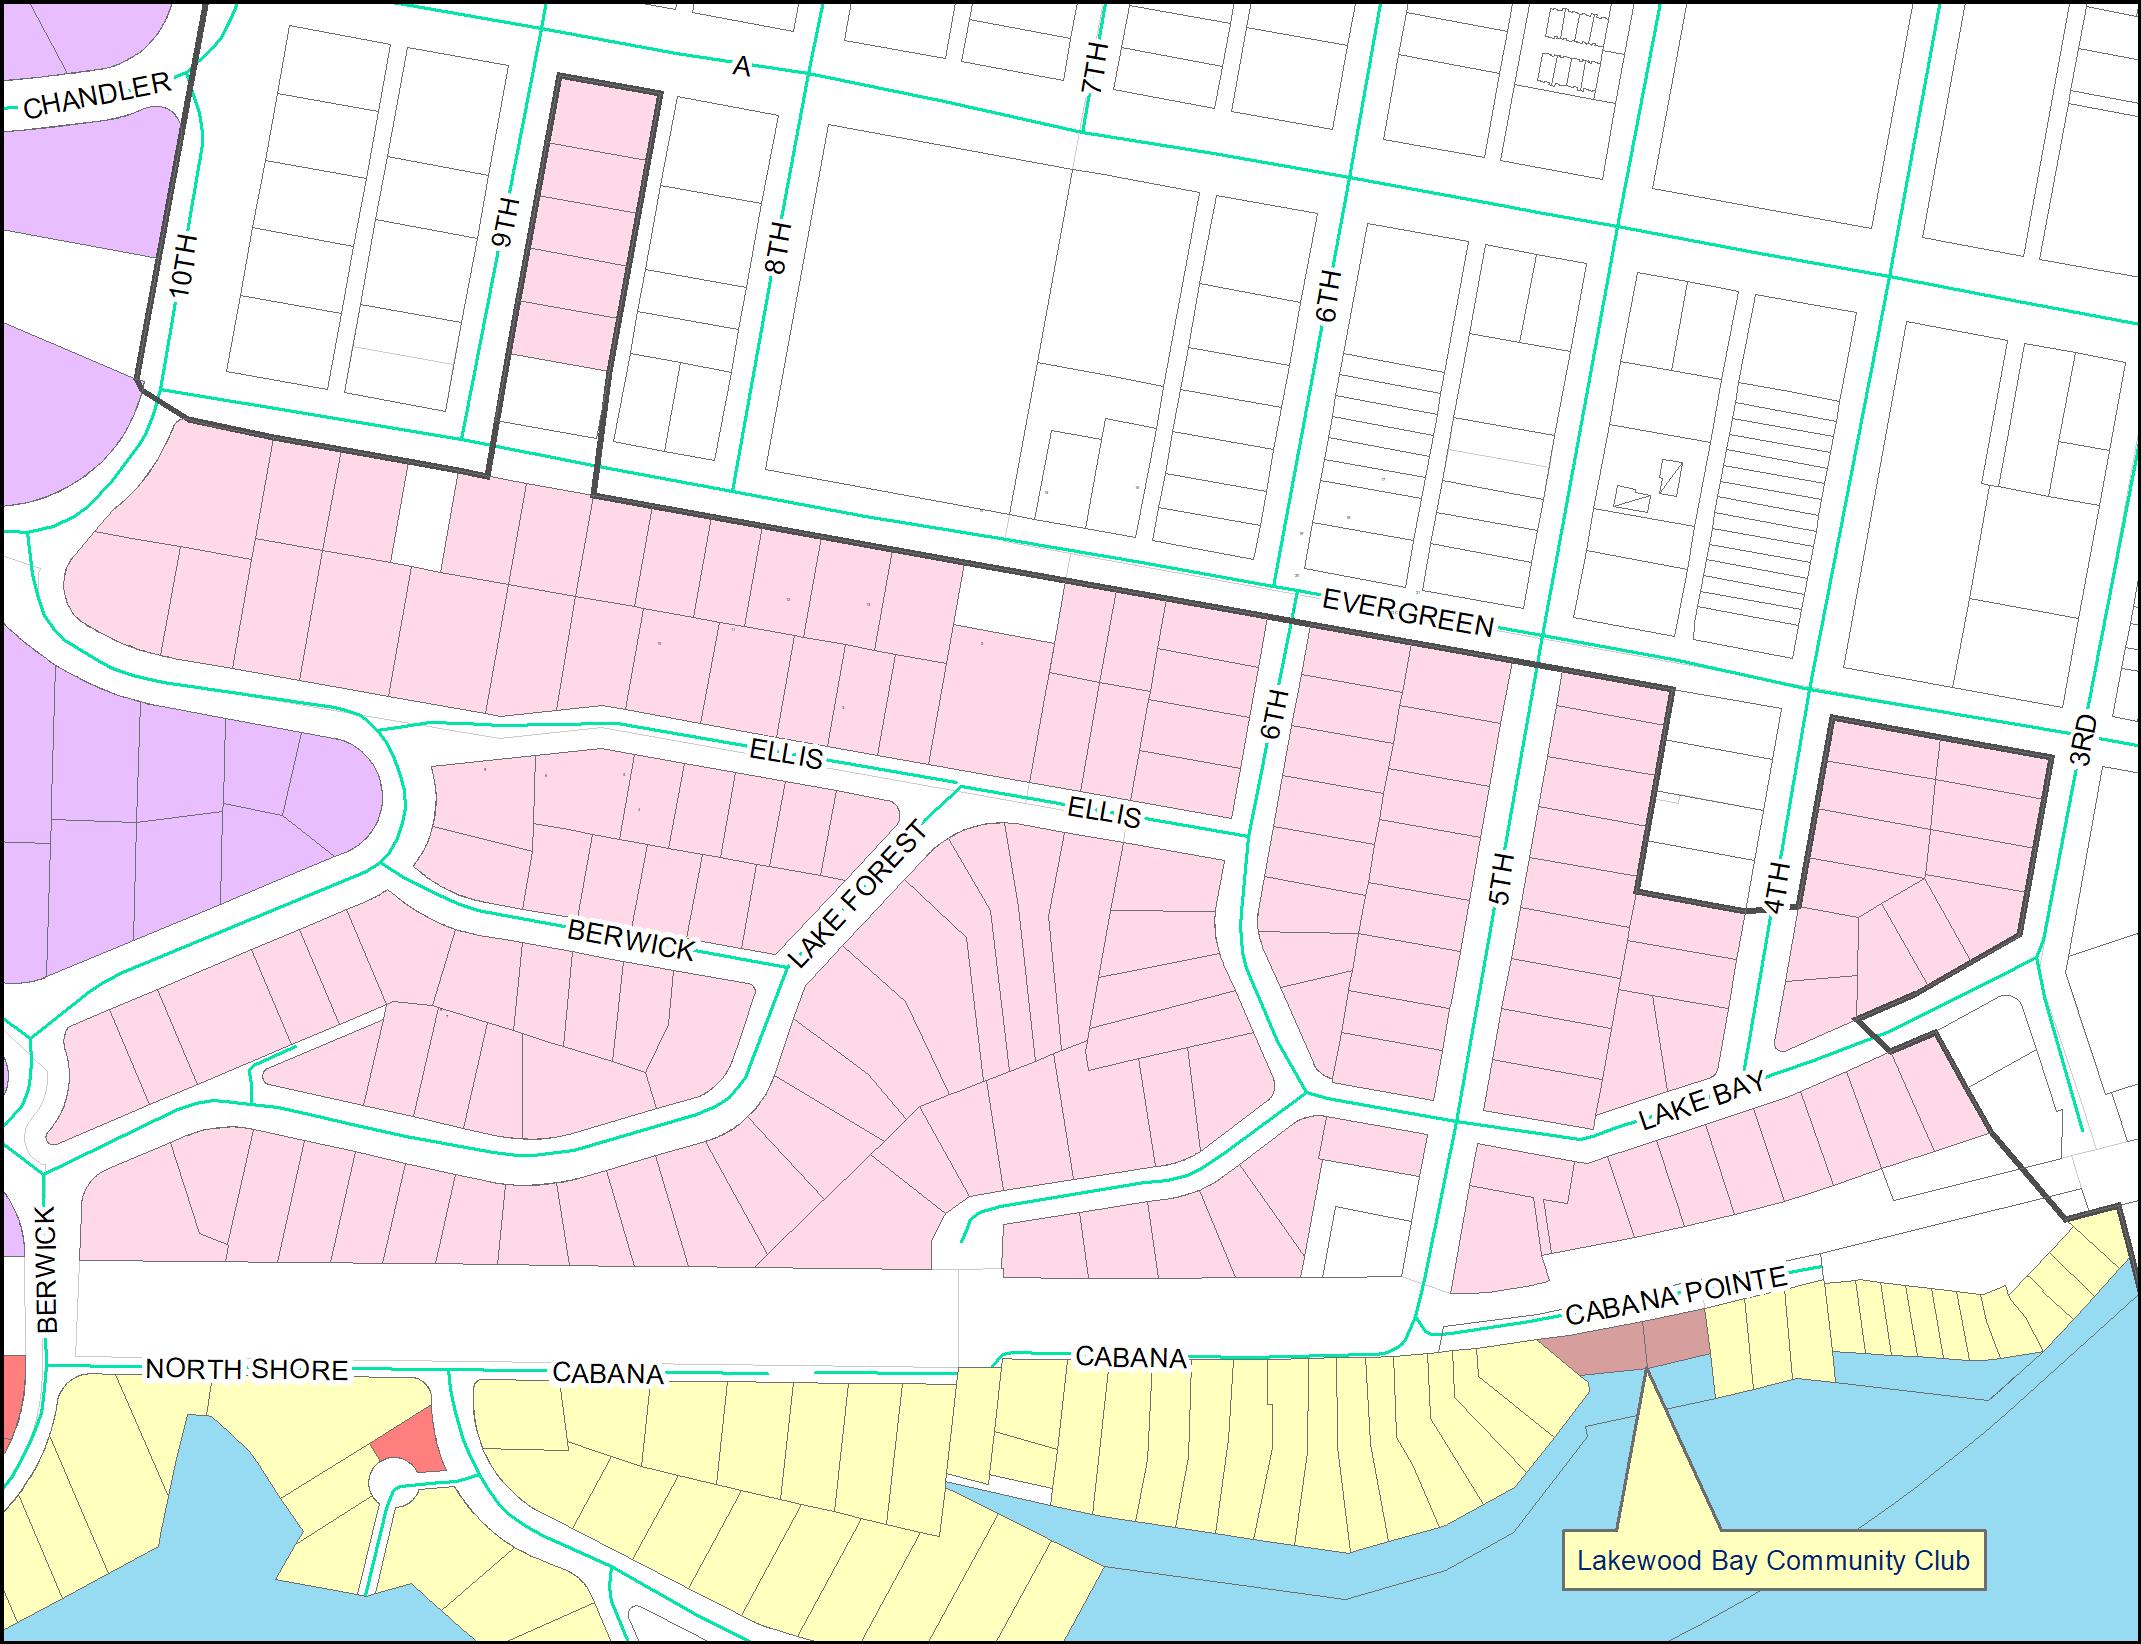 Lakewood Bay Community Club Map